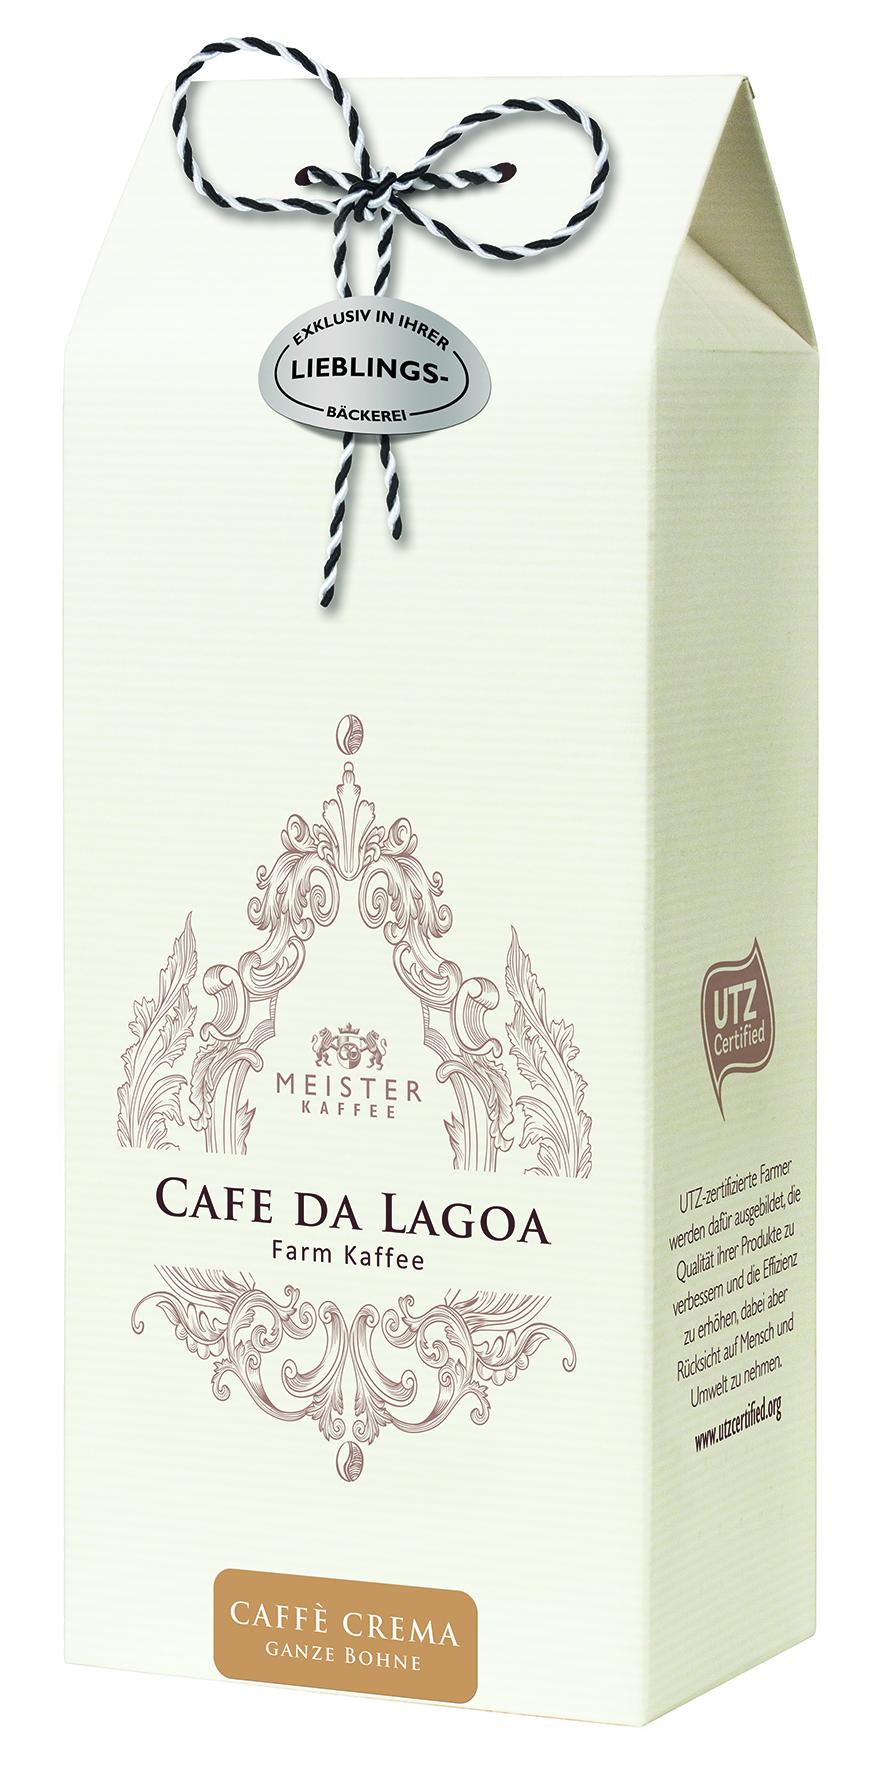 Cafe da Lagoa - neu bei uns